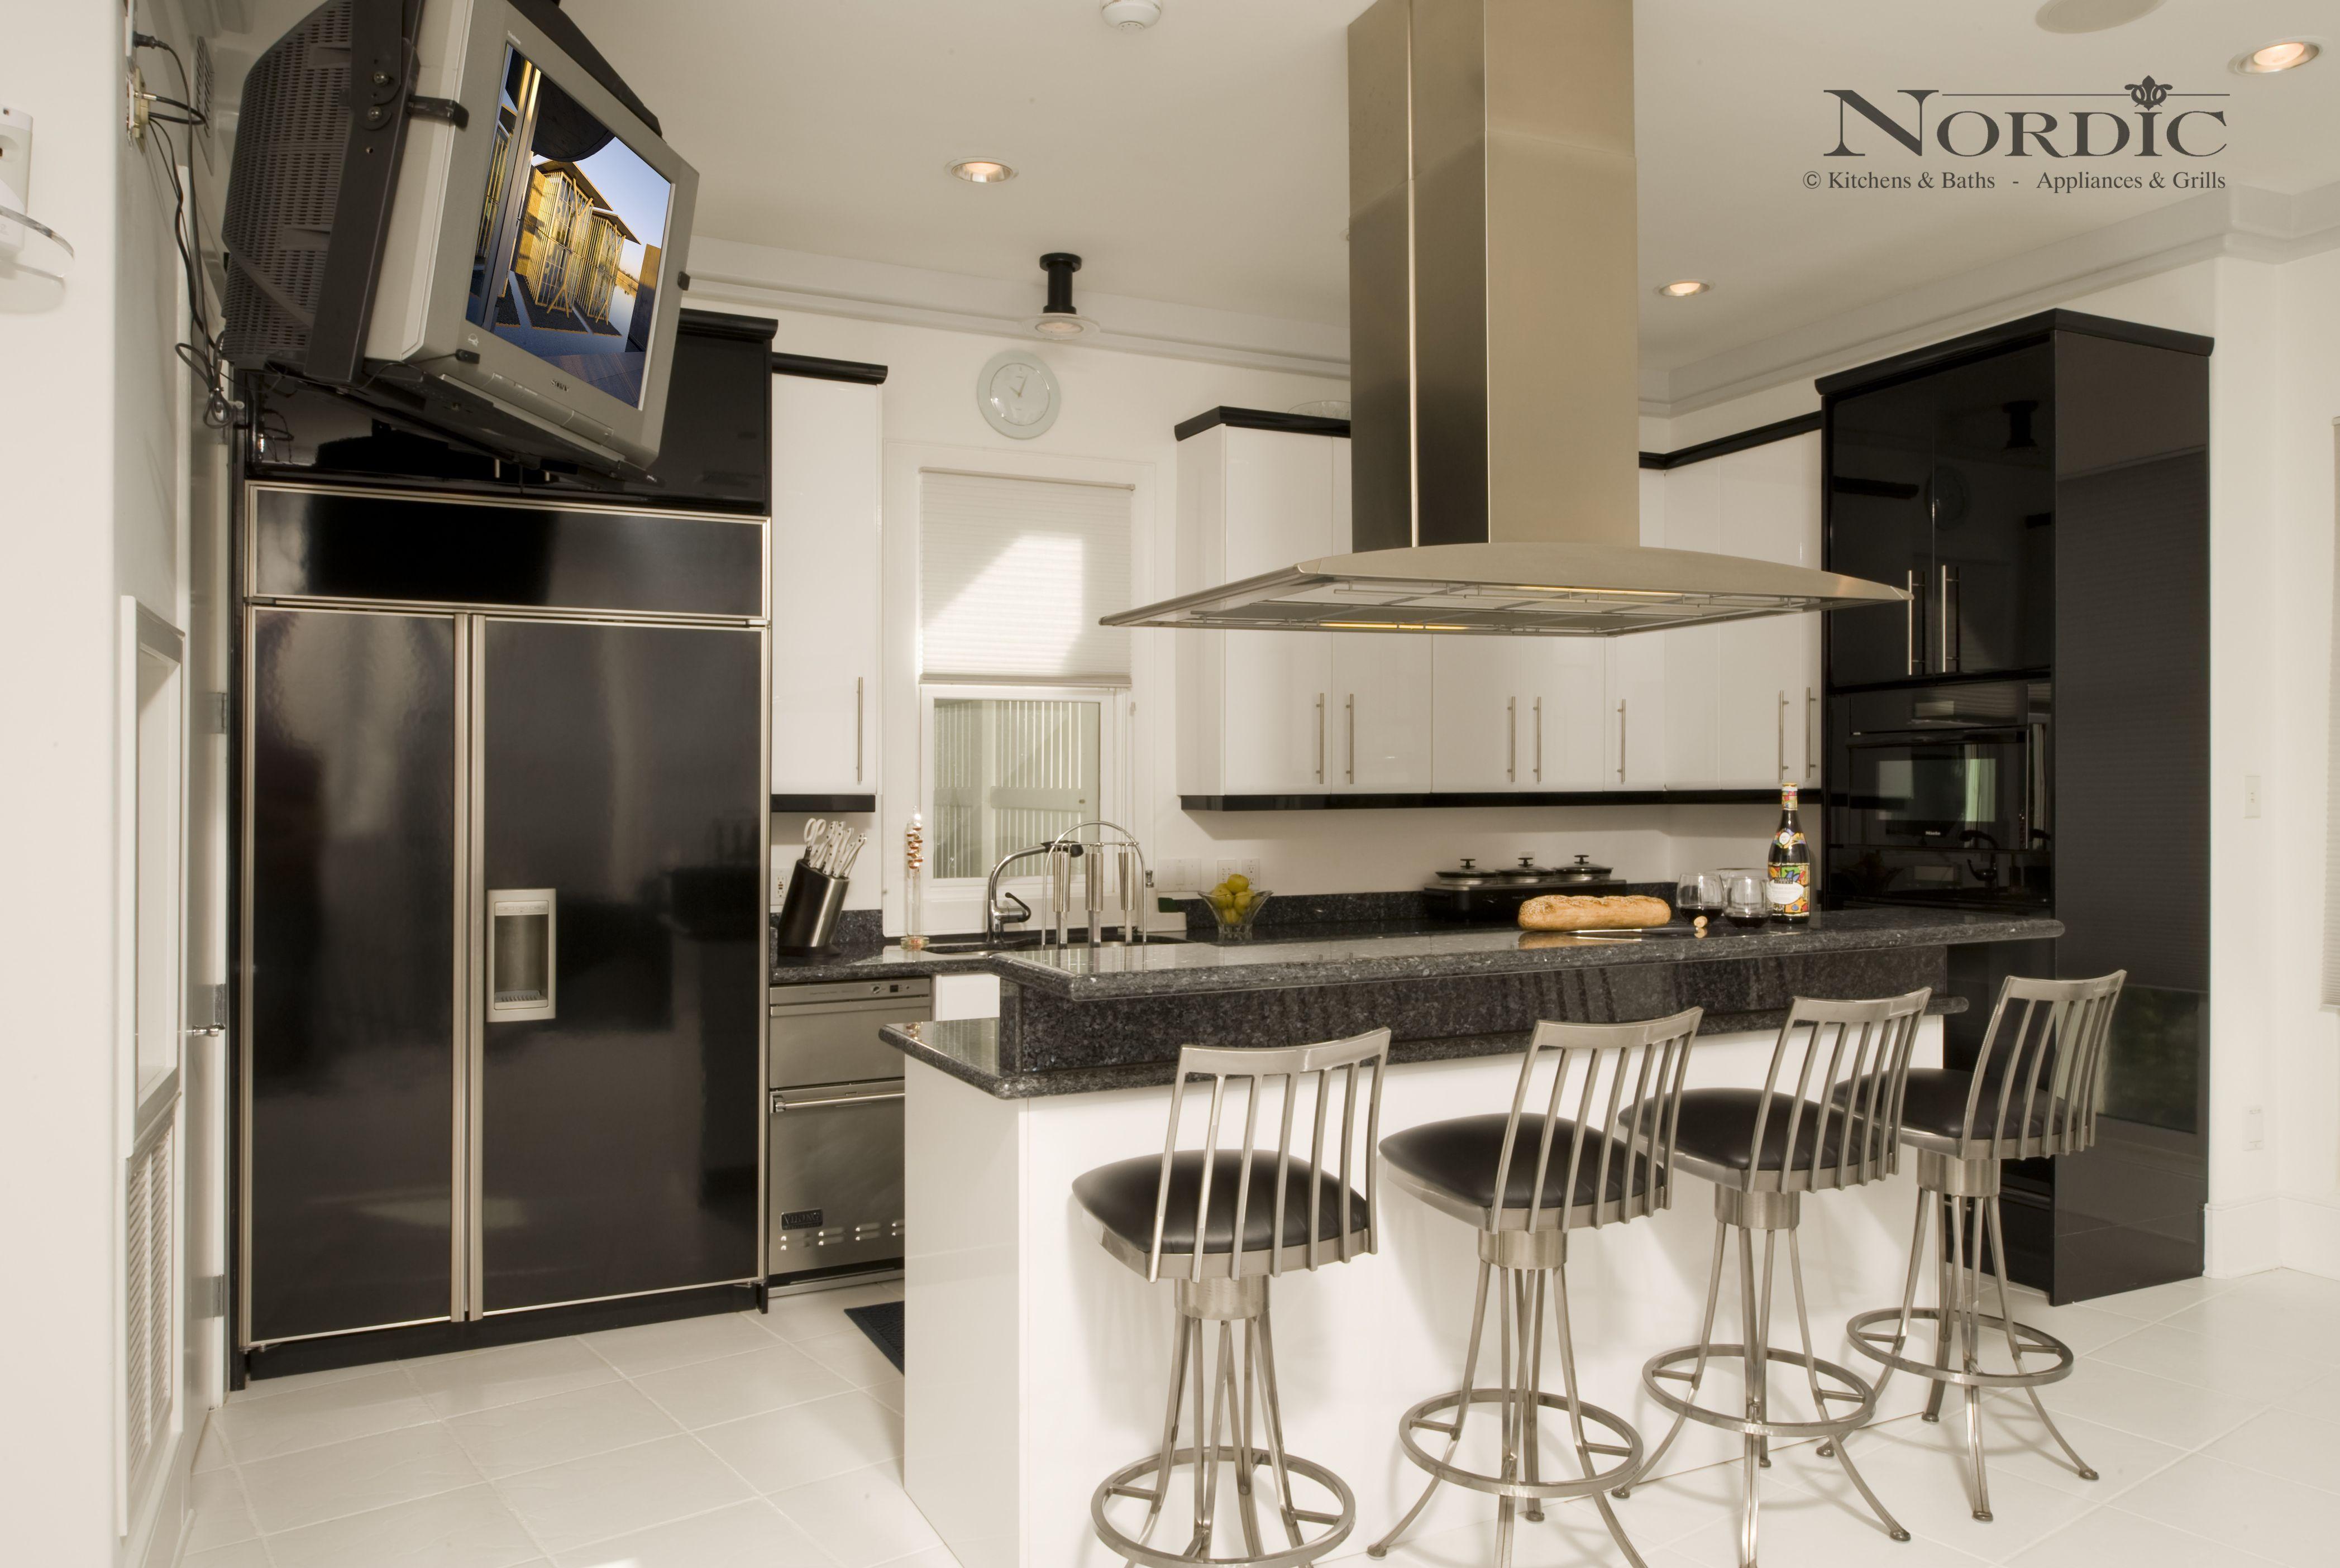 Nordic Kitchens and Baths, Inc., Metairie Louisiana ...